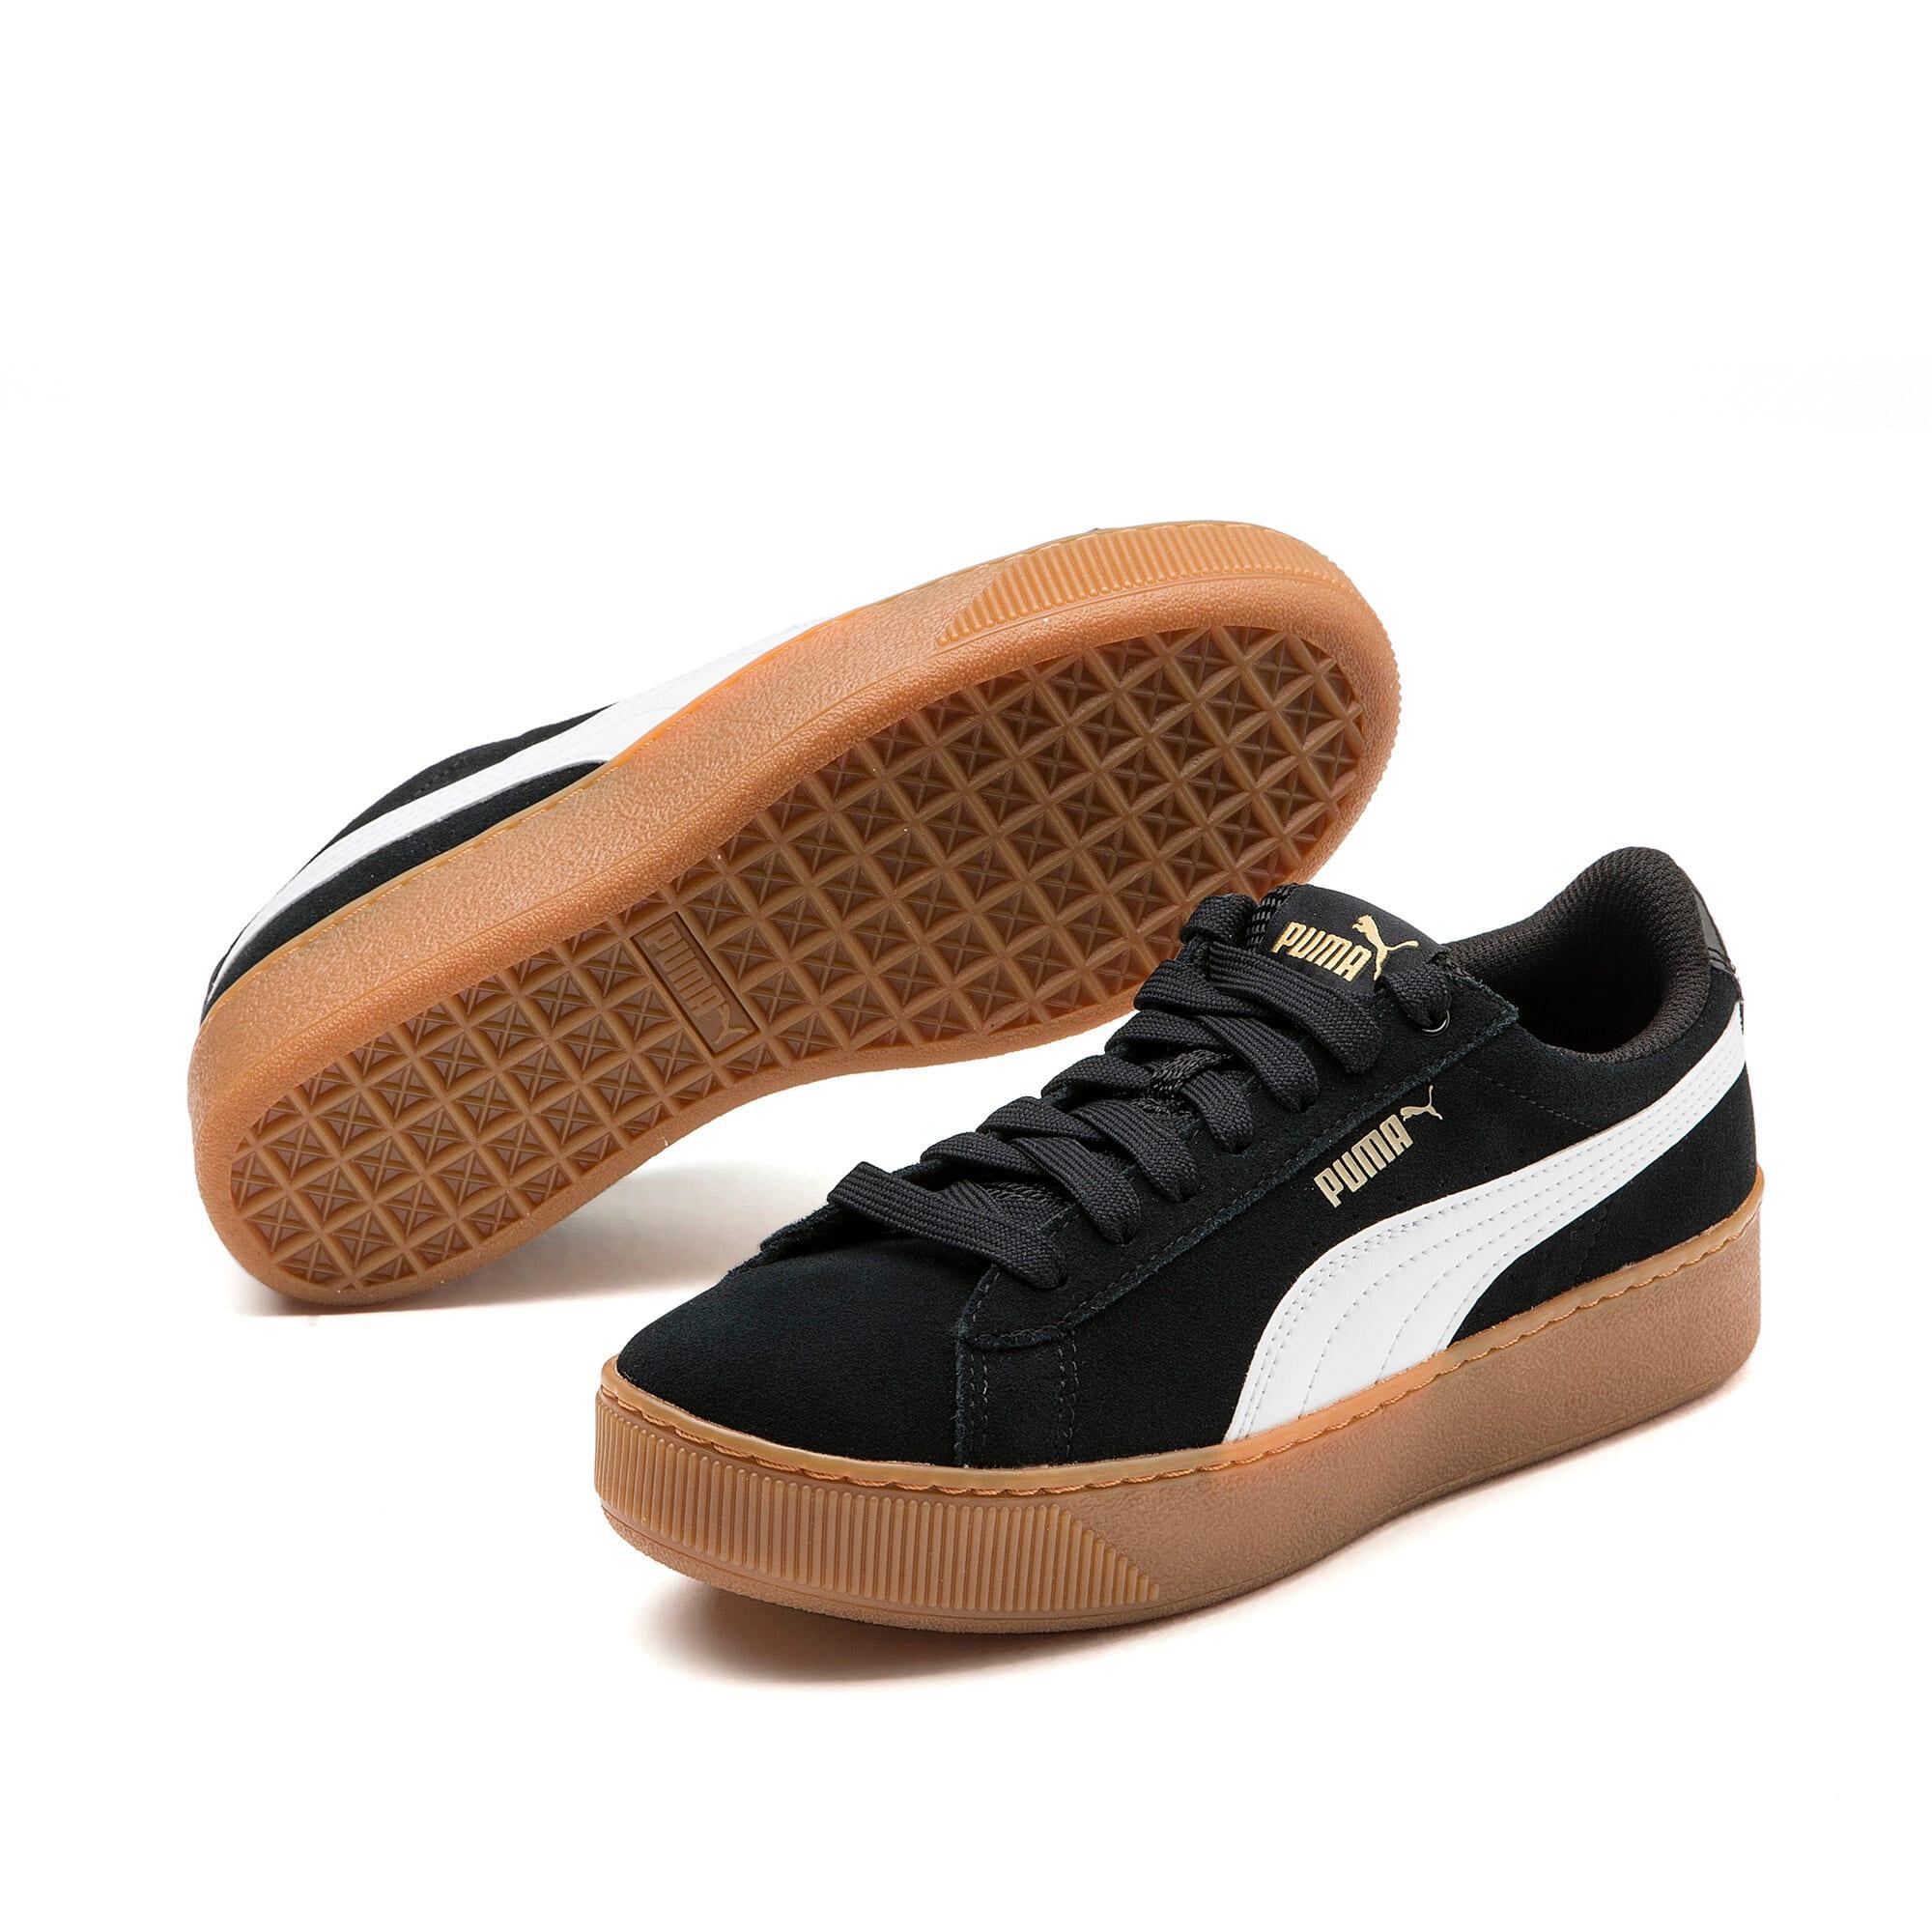 Damen Vikky Damen Sneaker Platform Platform Sneaker Platform Vikky Sneaker Vikky Platform Vikky Damen nkNw8O0PX